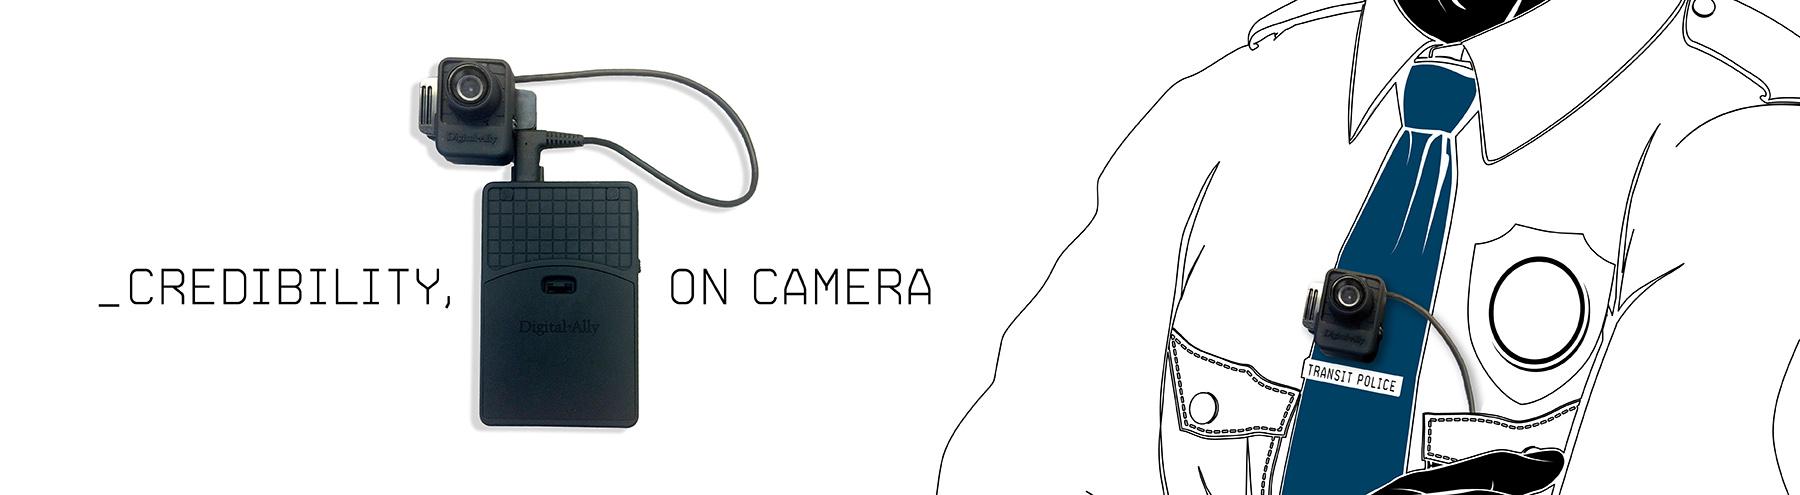 Credibility, on Camera